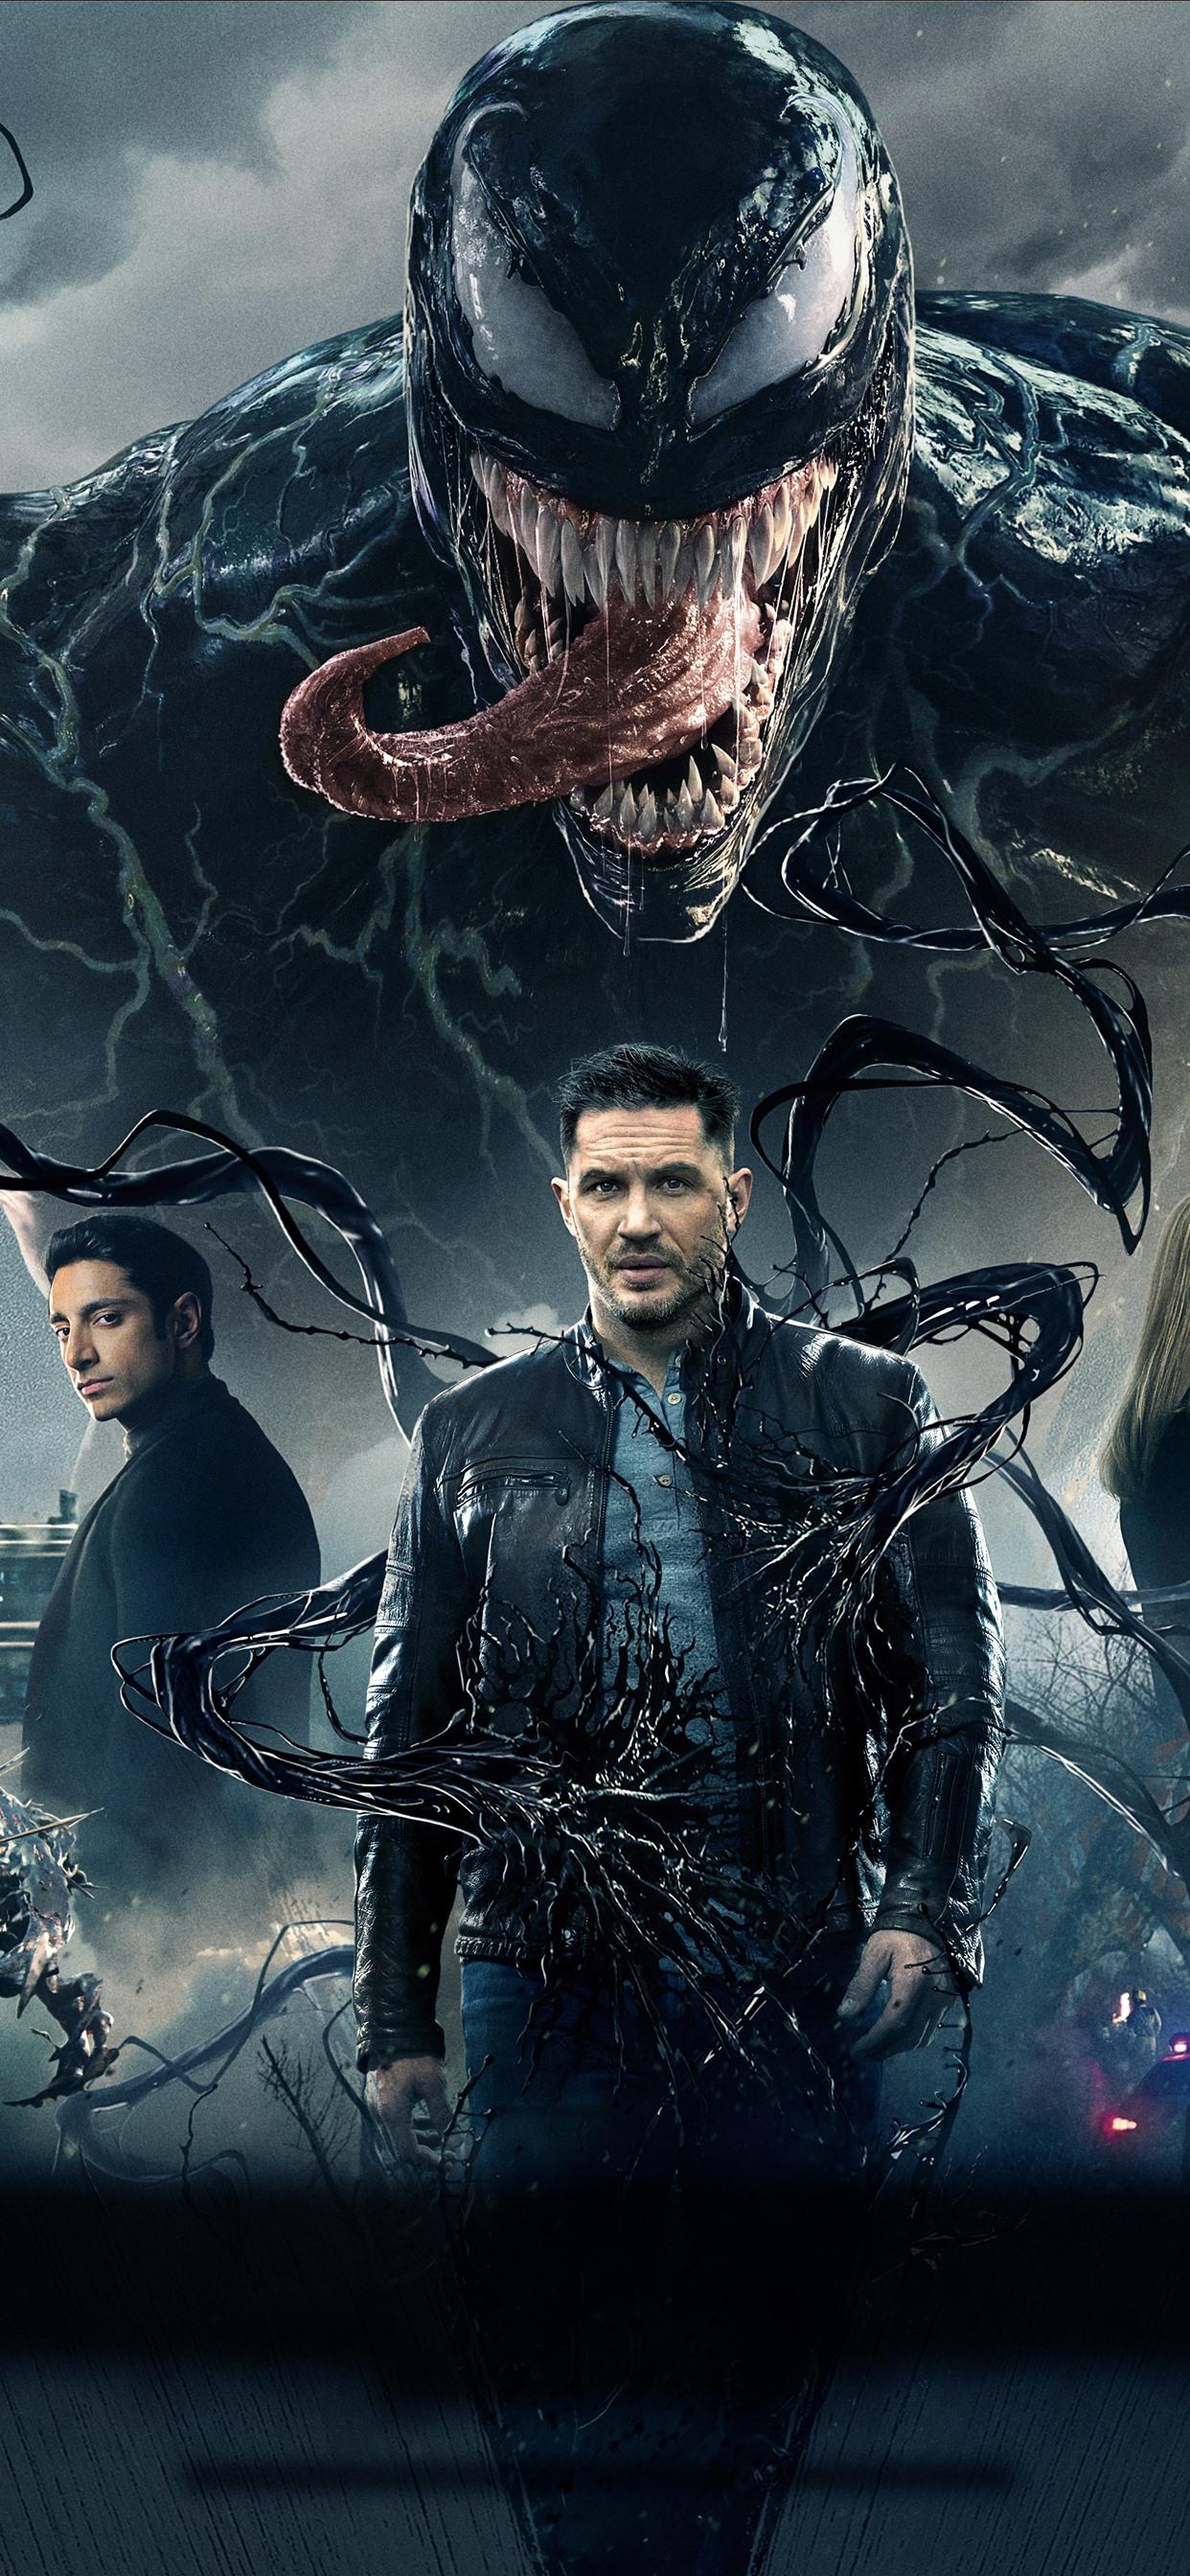 Venom 2018 Movie 1242x2688 Iphone Xs Max Wallpaper Background